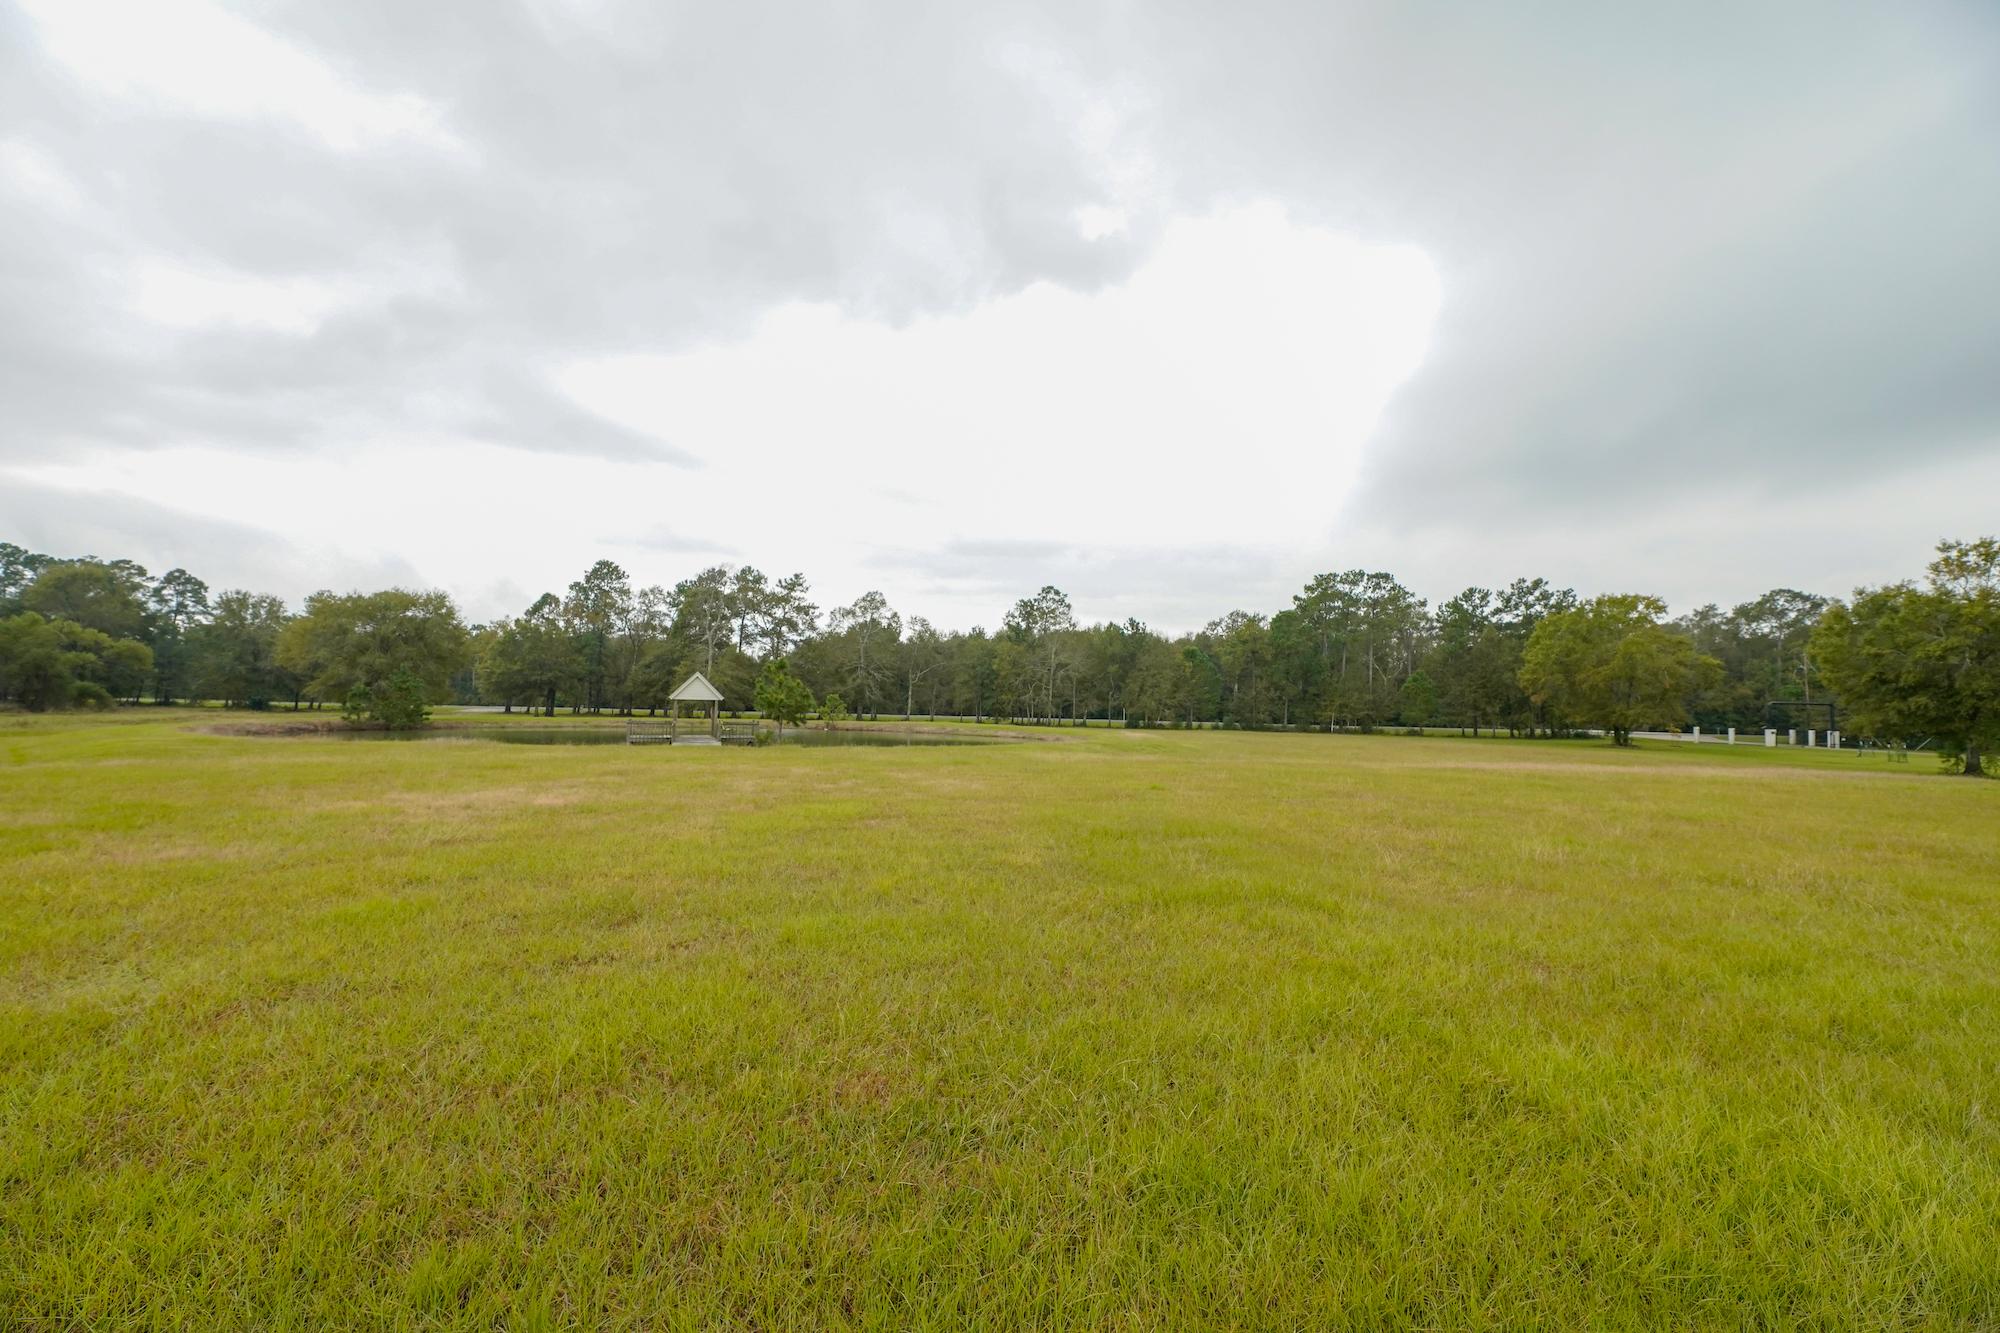 Jefferson County Development Land - Image 17 of 36